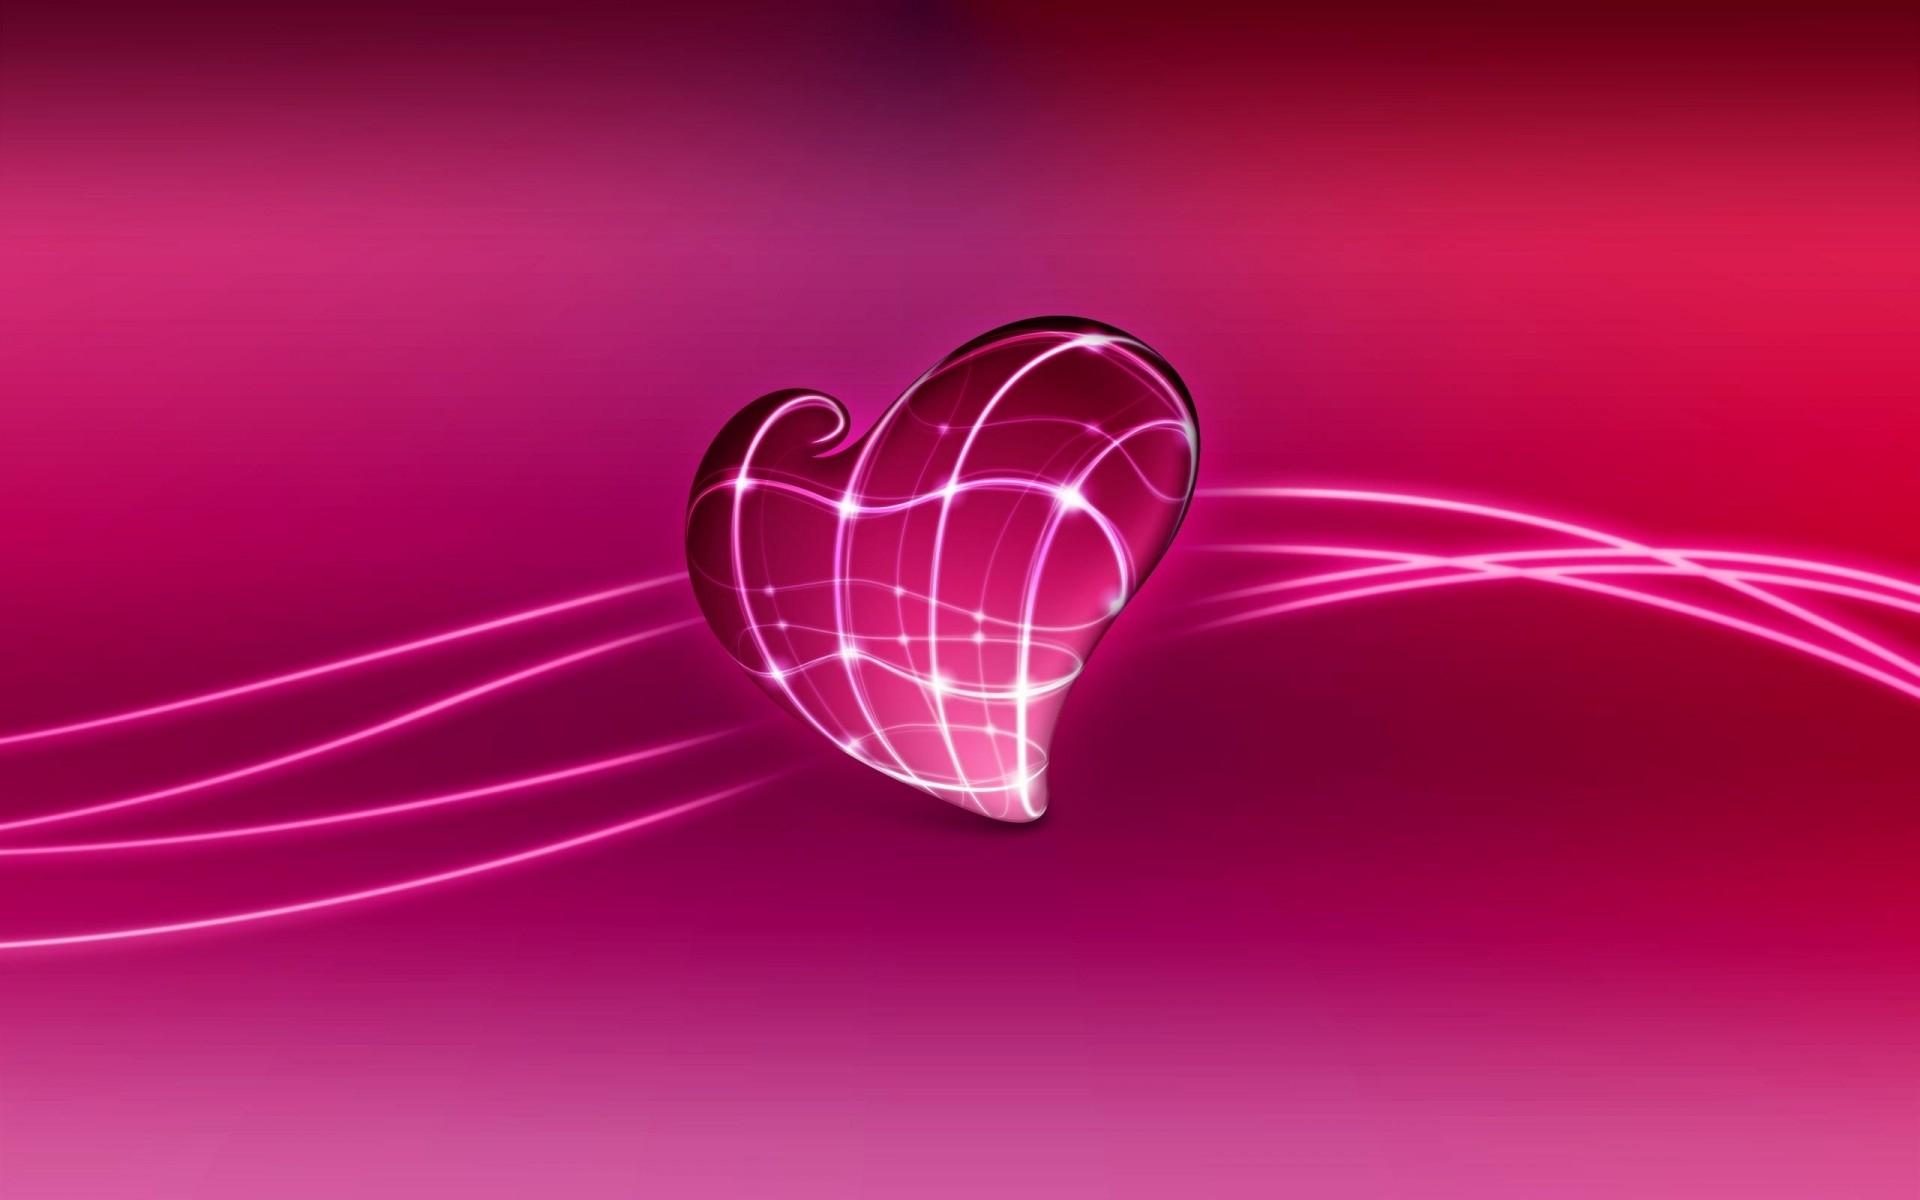 3d love heart wallpapers | hd wallpapers | id #6661